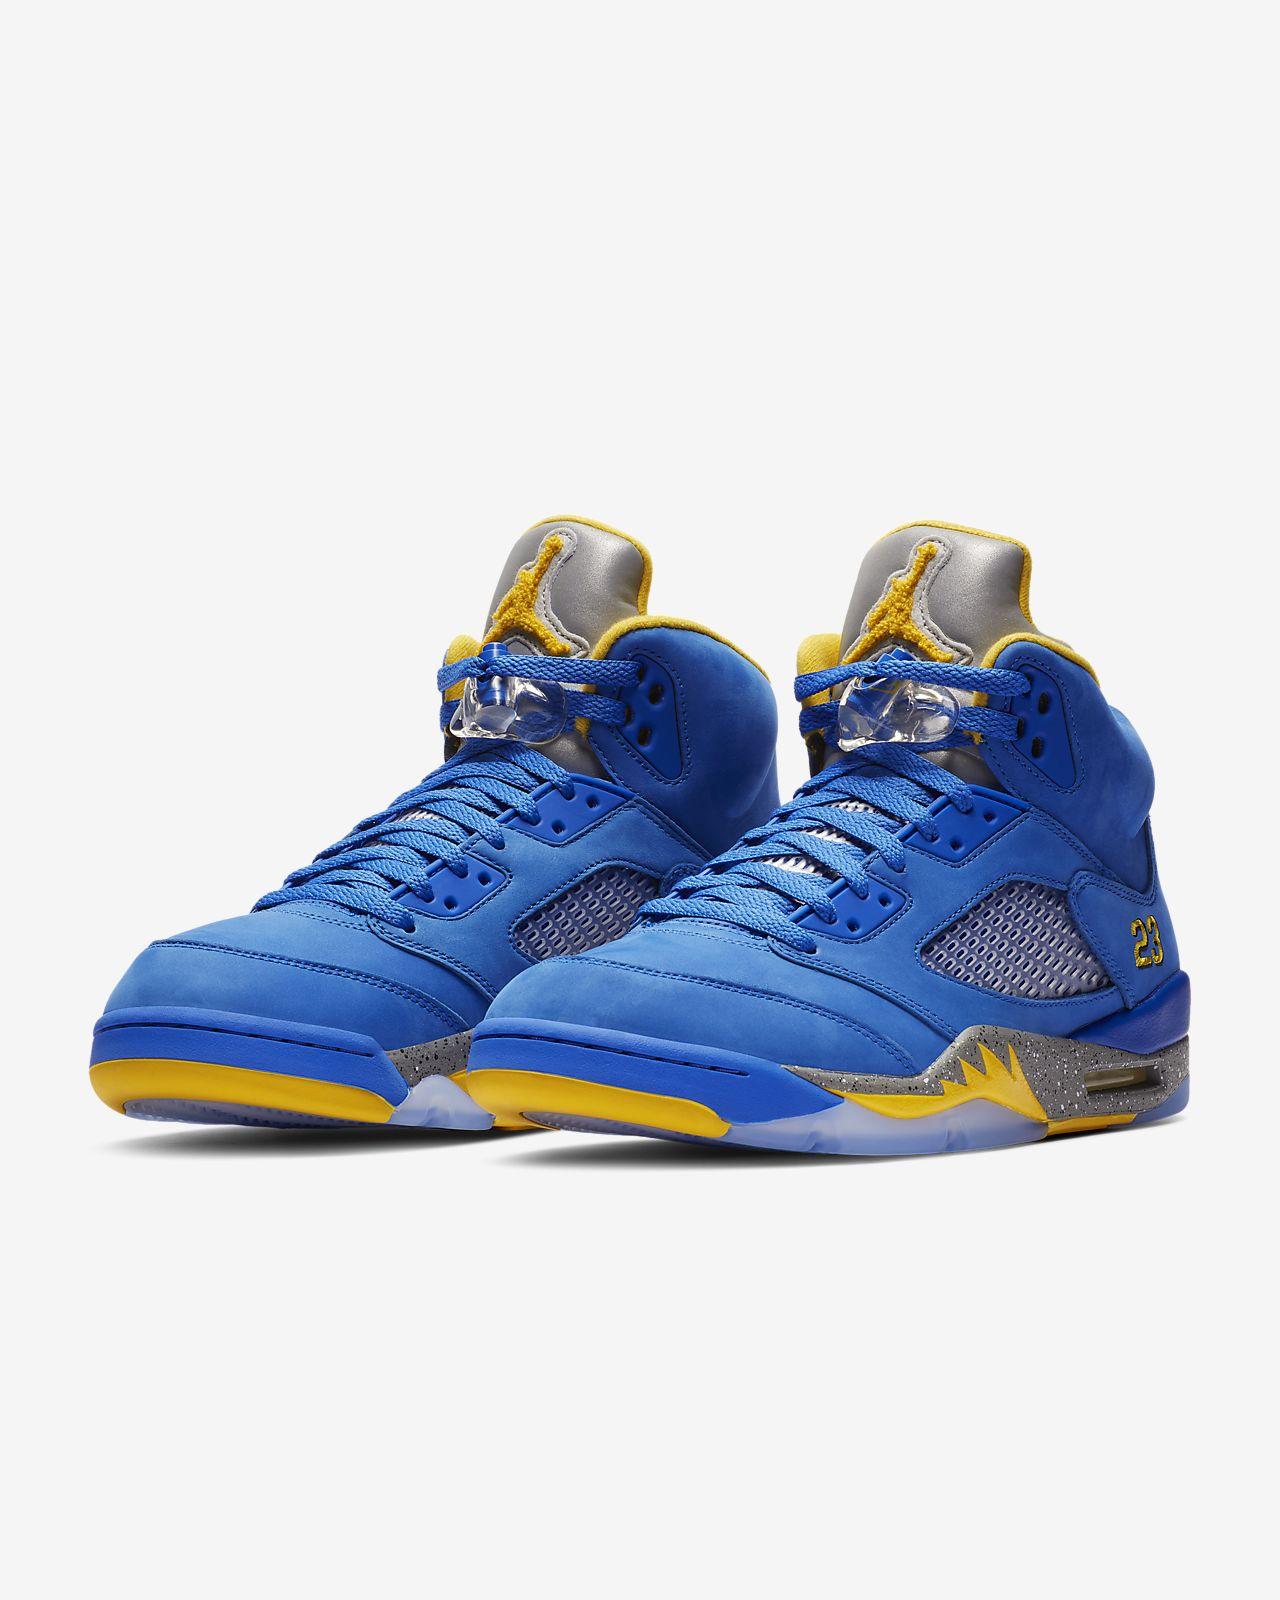 80d0628cfe18 Air Jordan 5 Laney JSP Men s Shoe. Nike.com GB